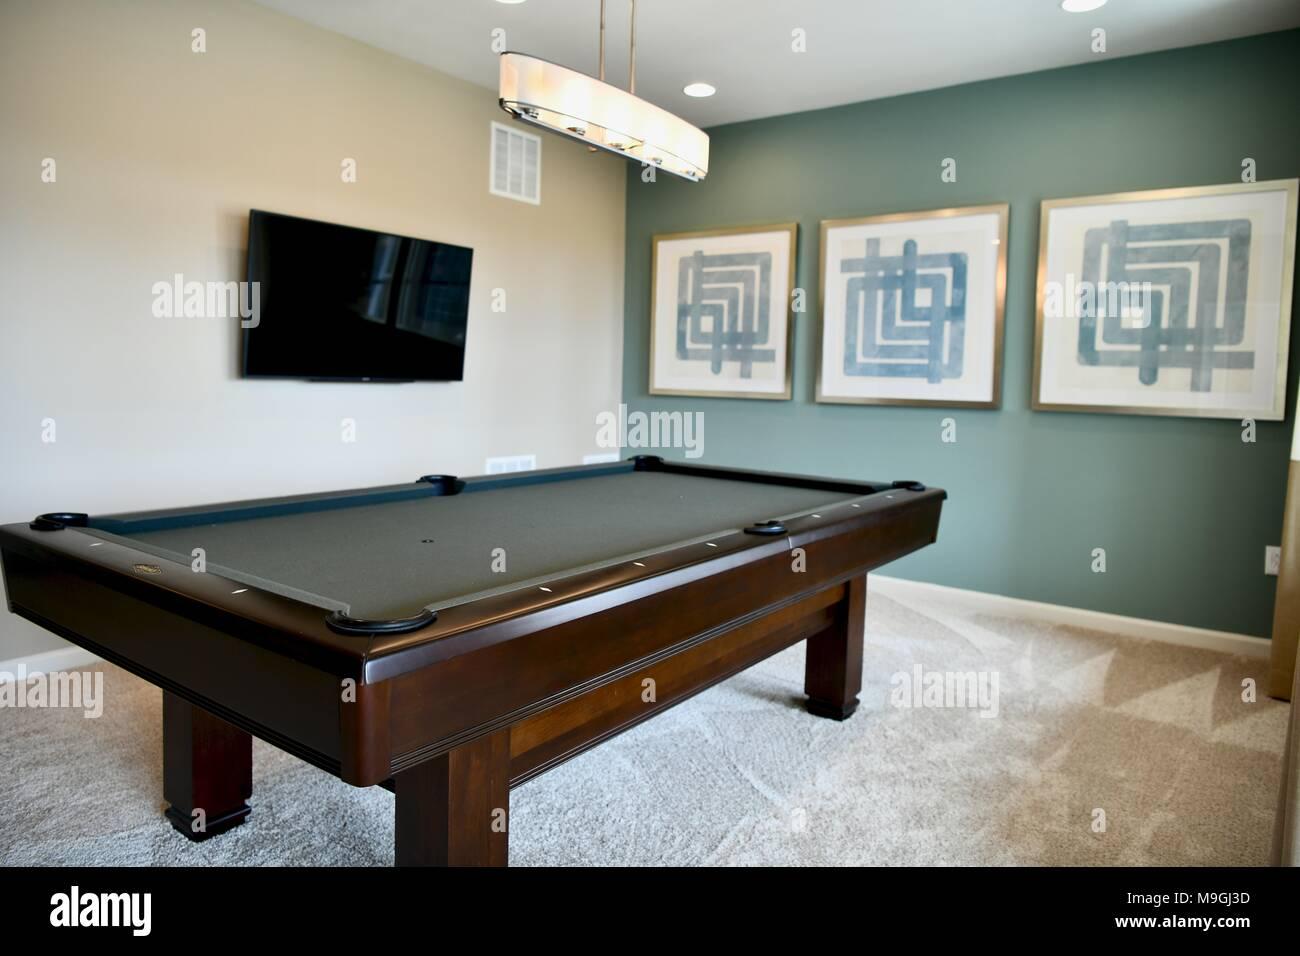 Pool table inside modern home living room Stock Photo ...